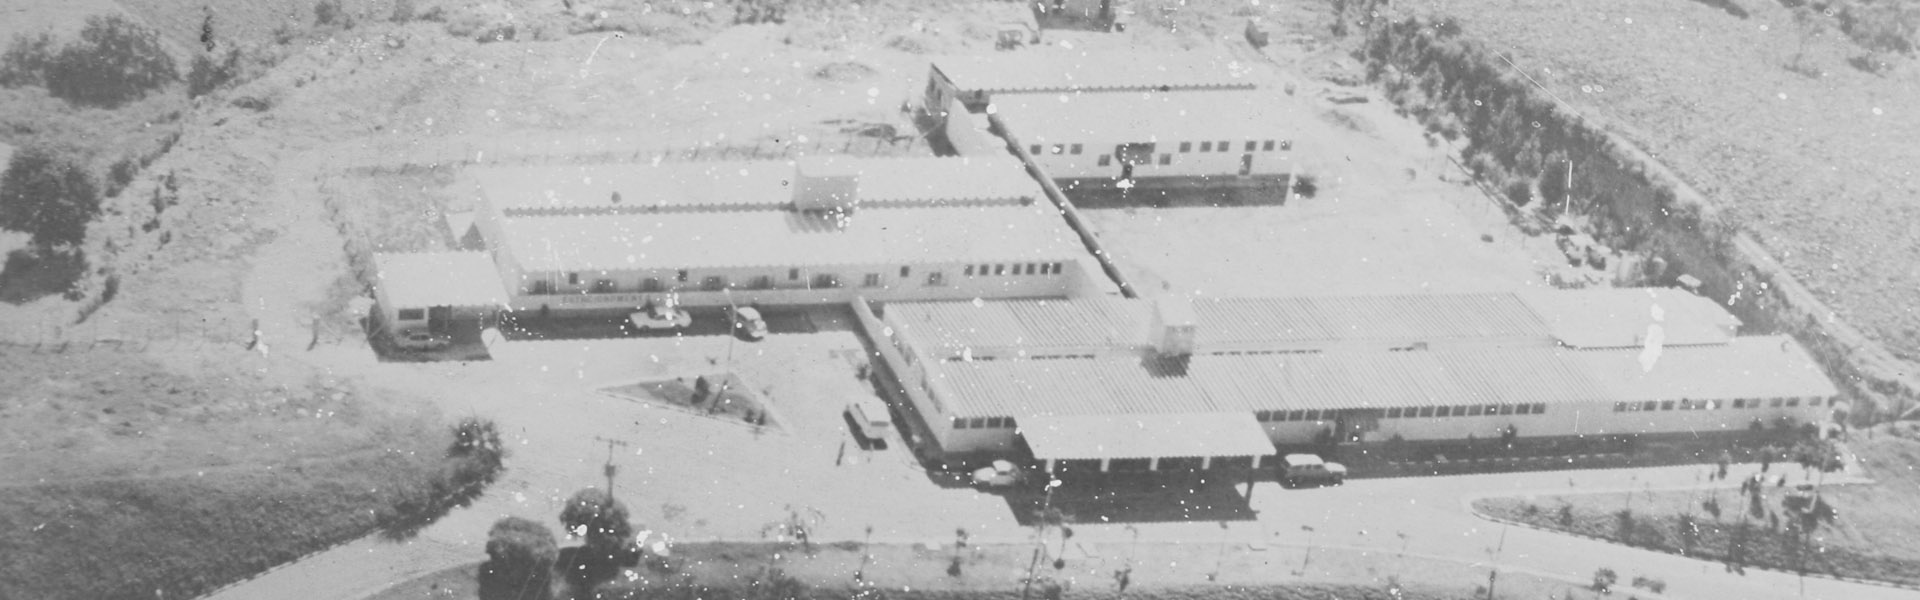 hospital-foto1